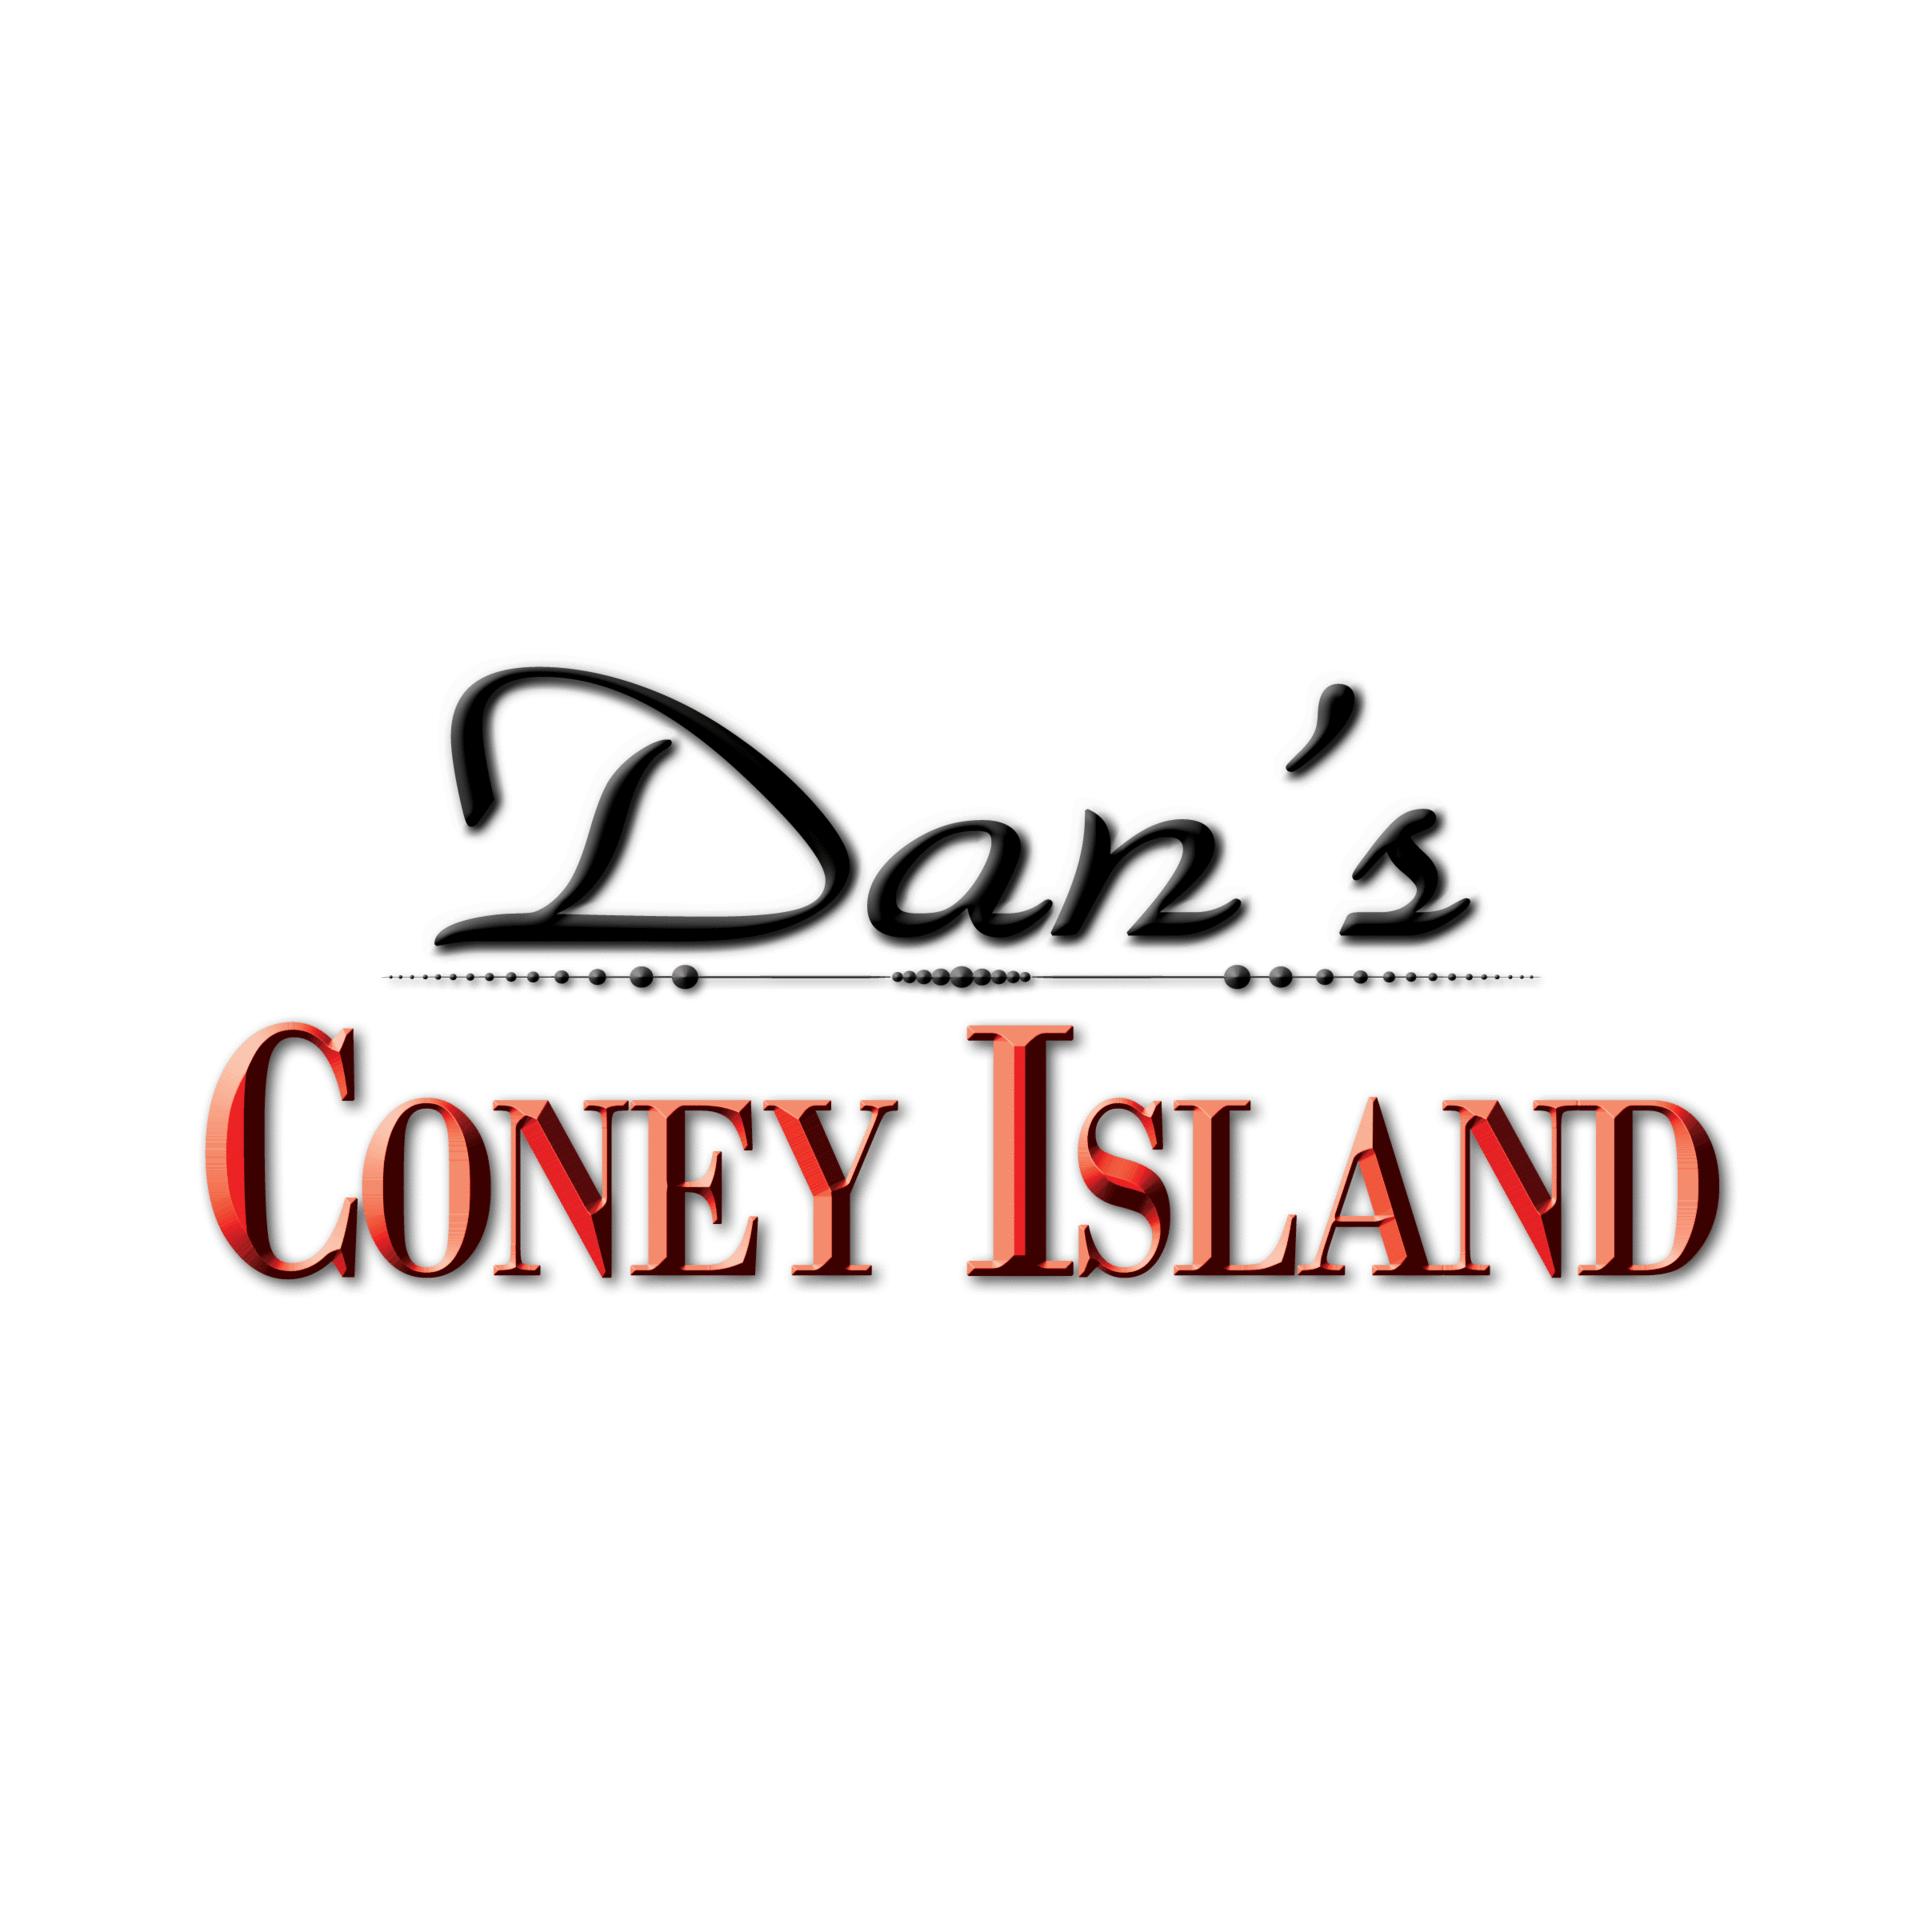 Dan's Coney Island